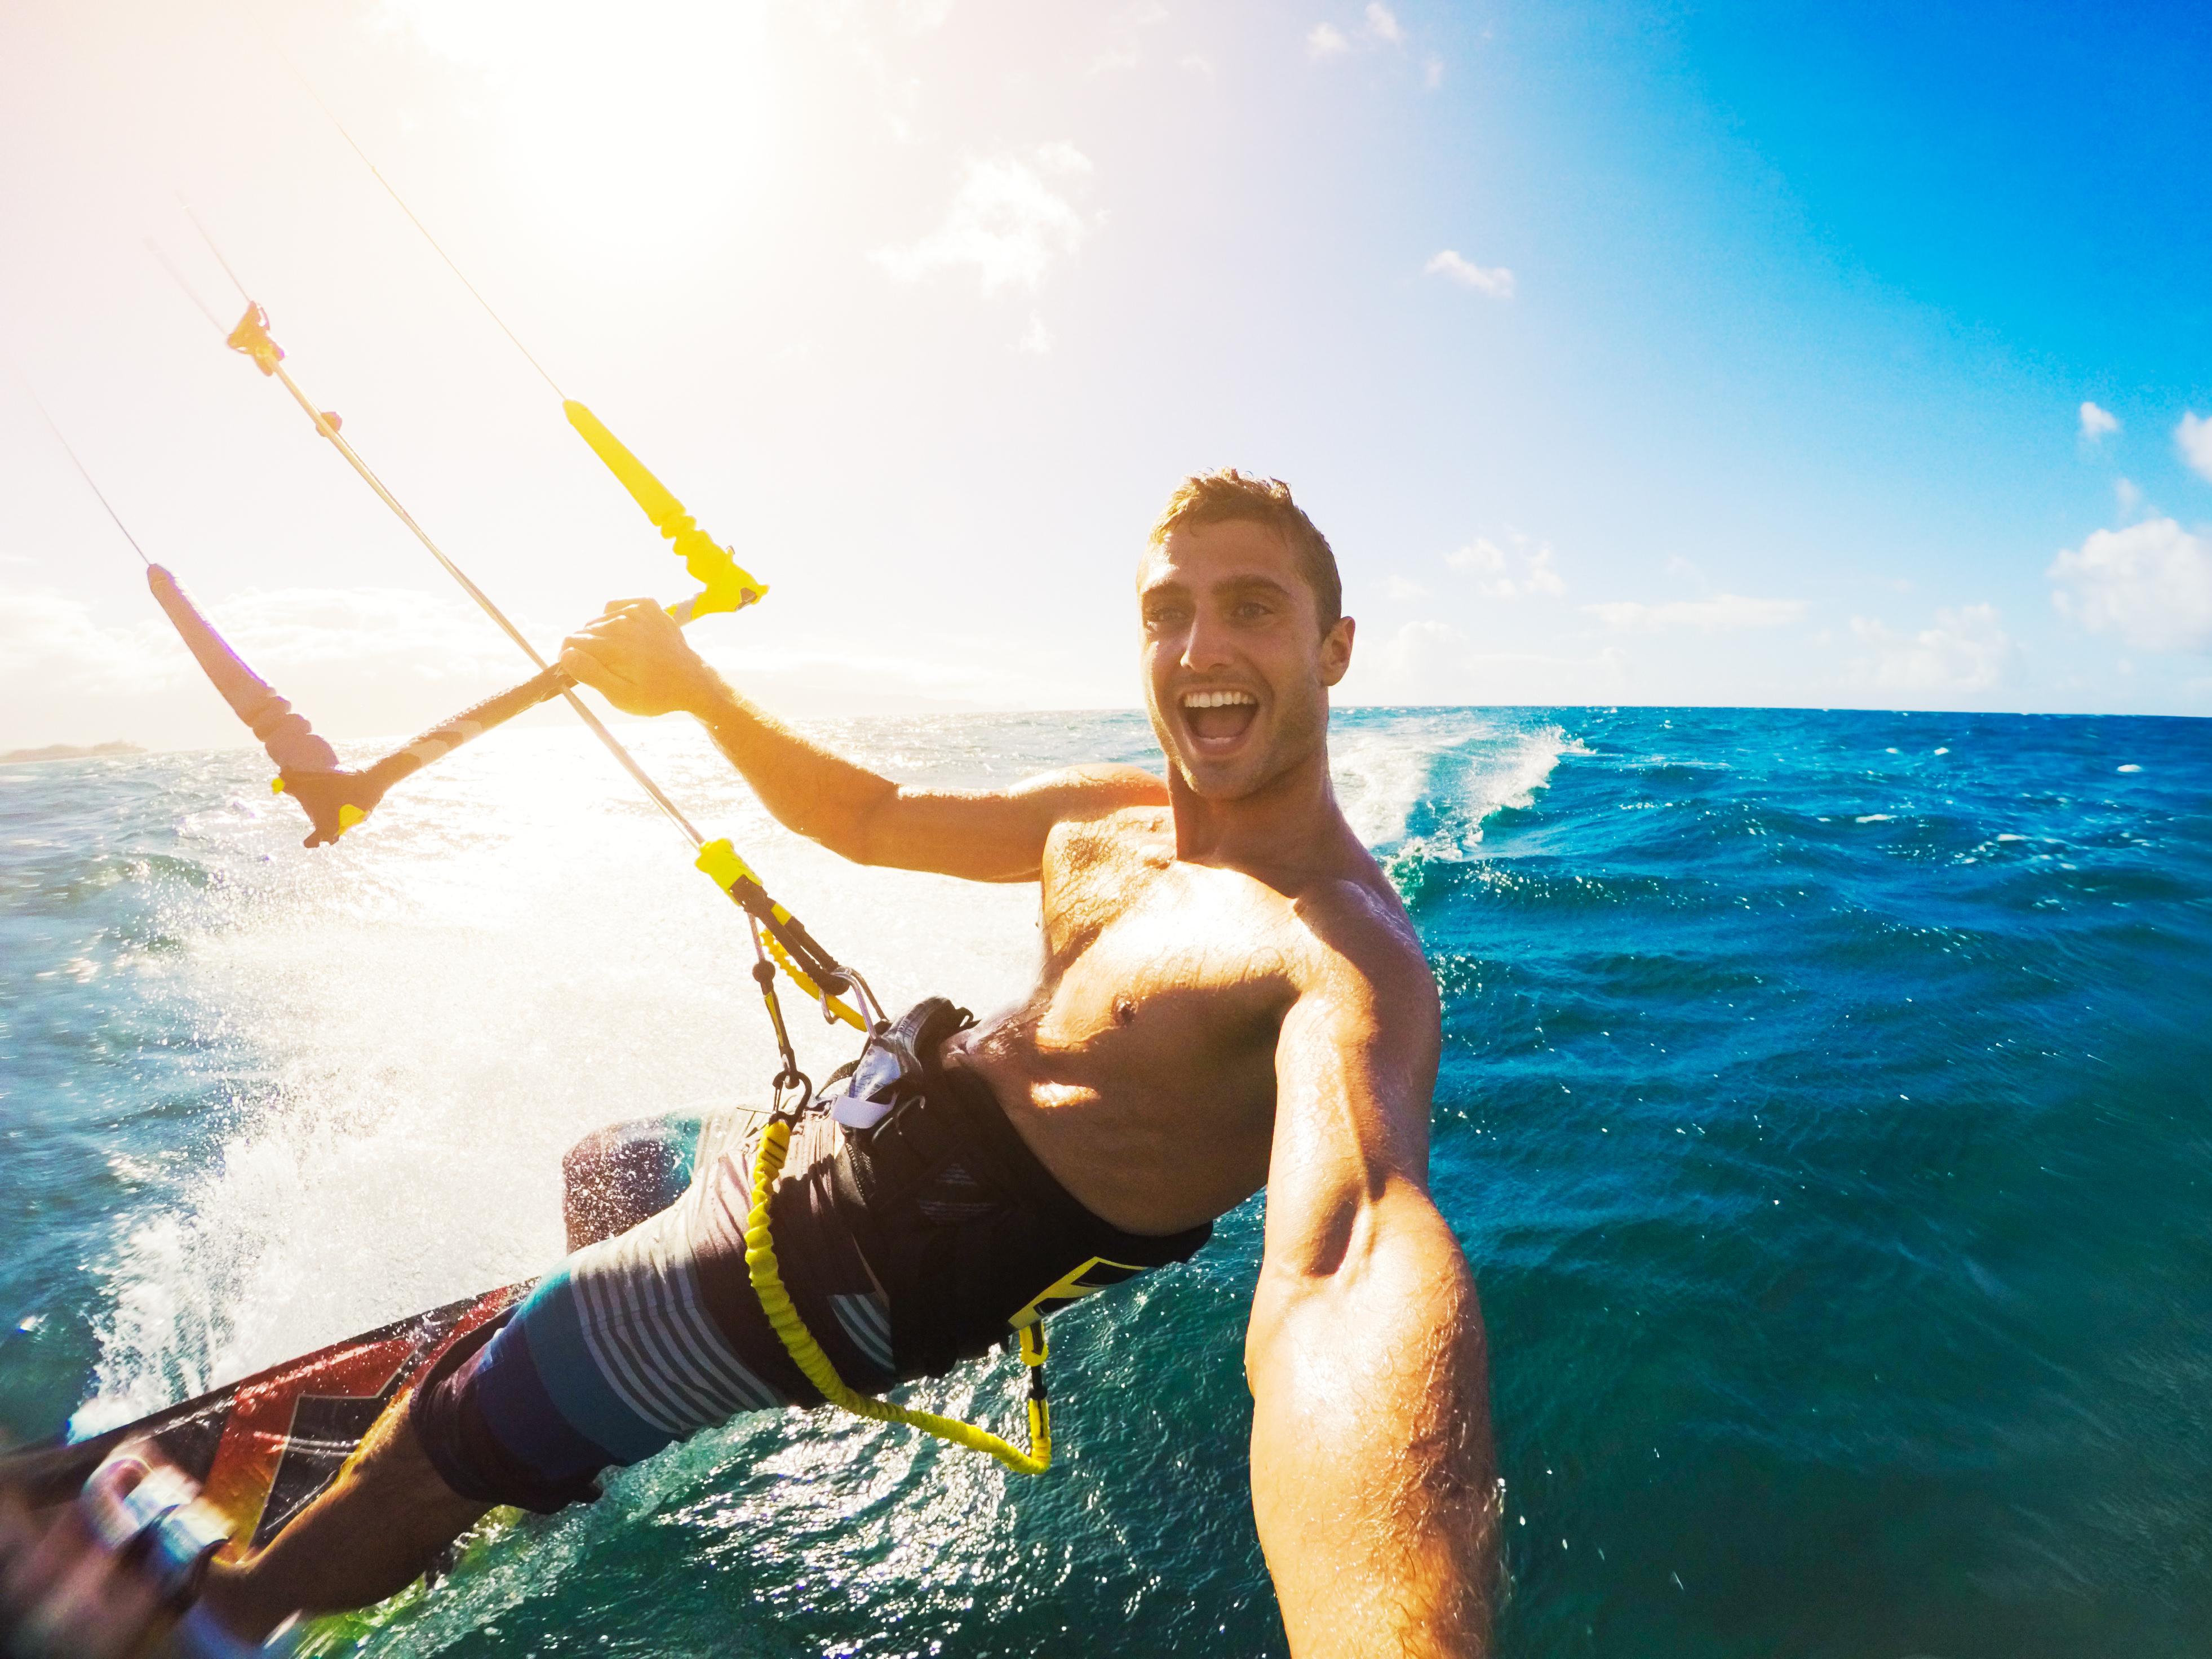 bigstock-Kiteboarding-Fun-in-the-ocean-98409692.jpg